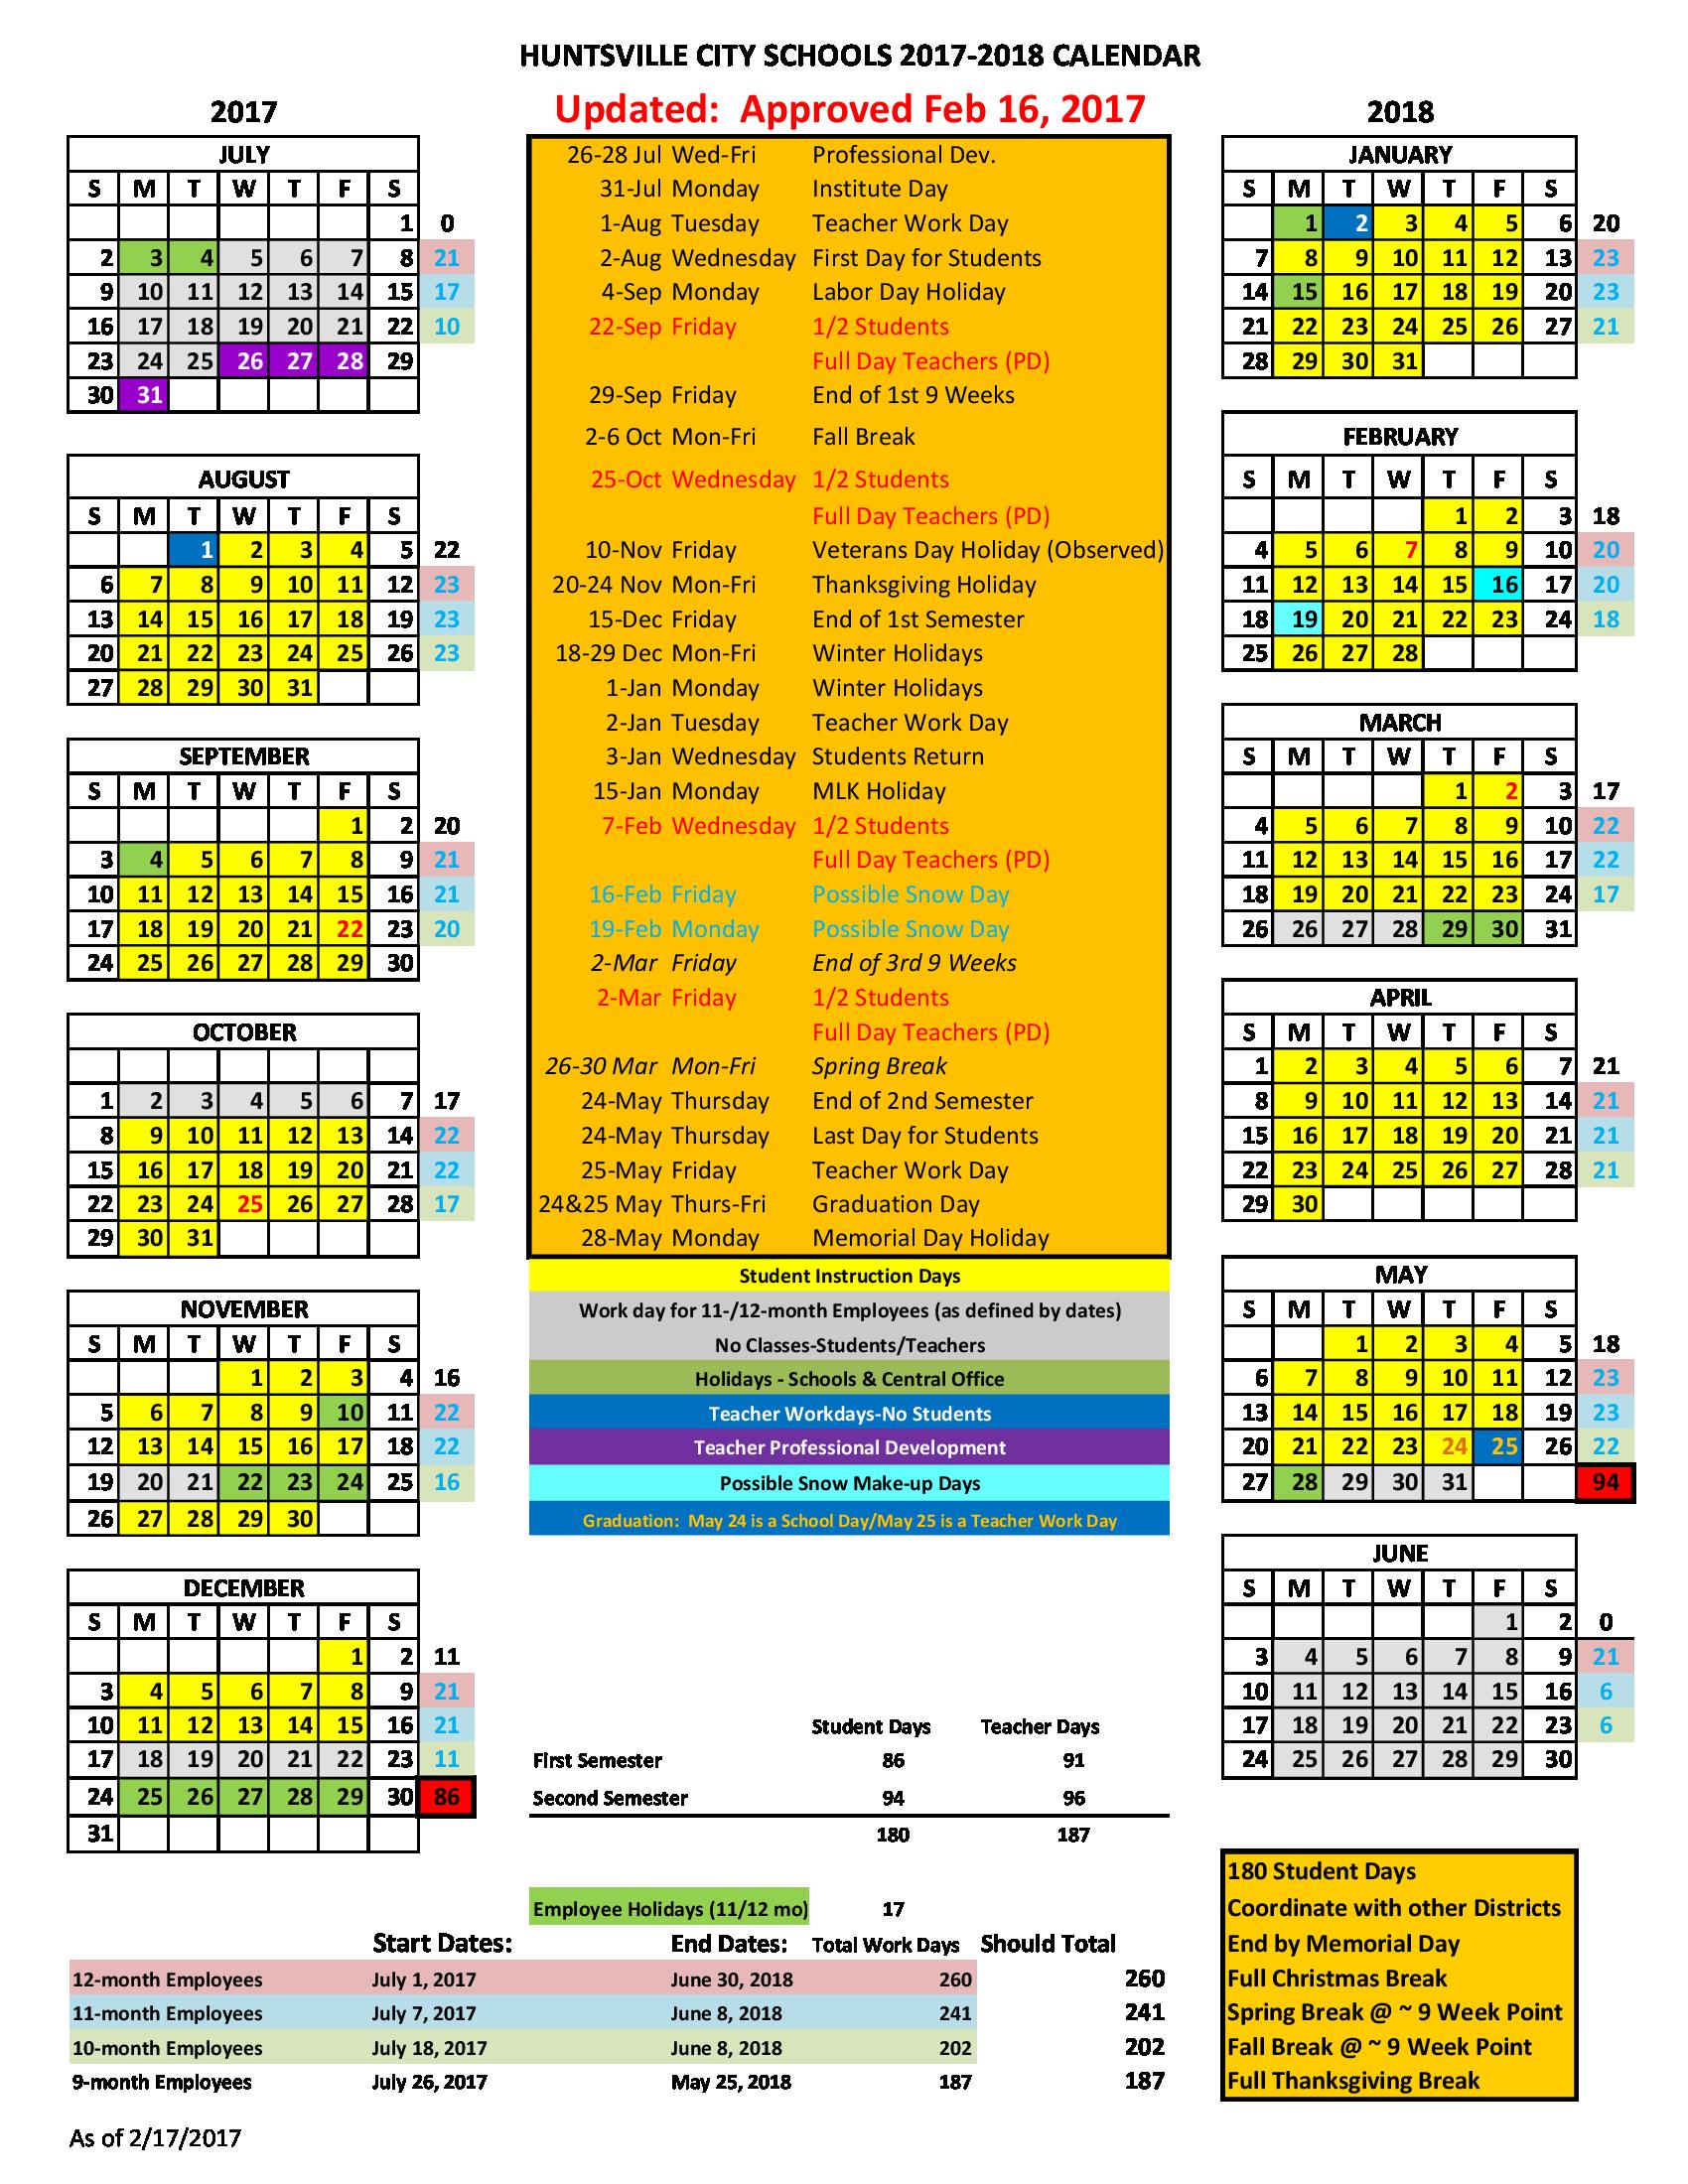 Williams School PK 8 PTA   Huntsville City Schools 2017 18 Calendar